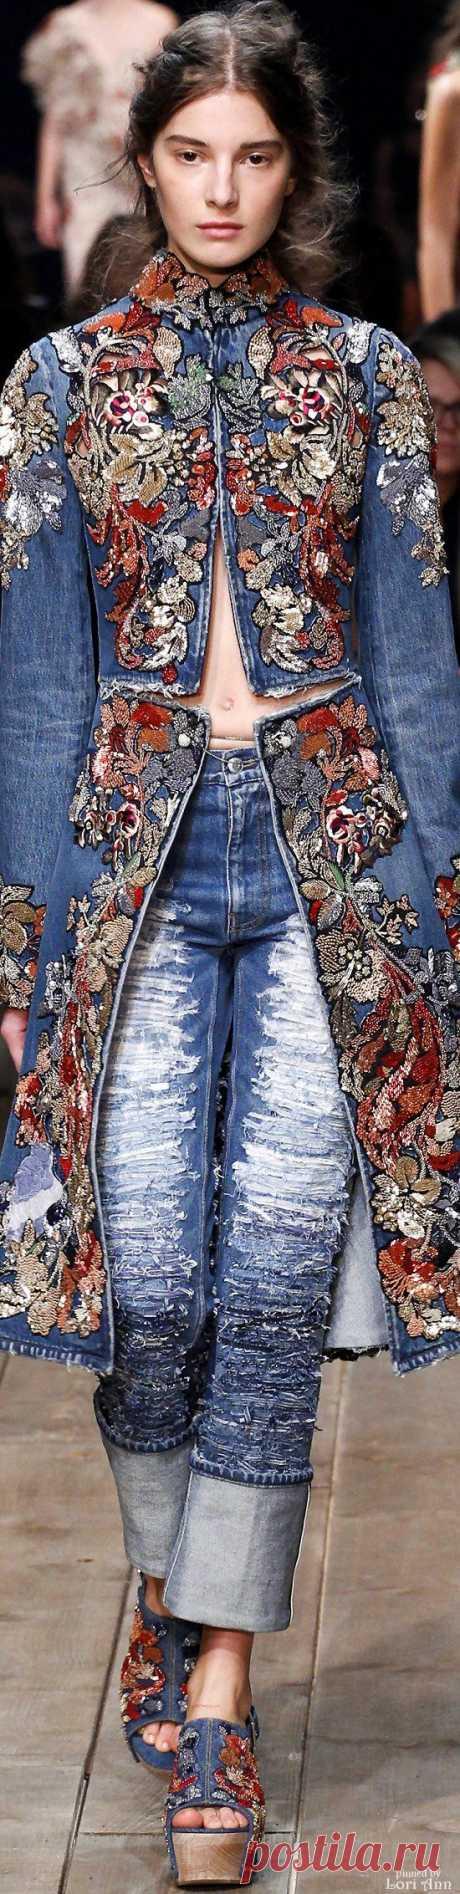 Alexander McQueen джинсы